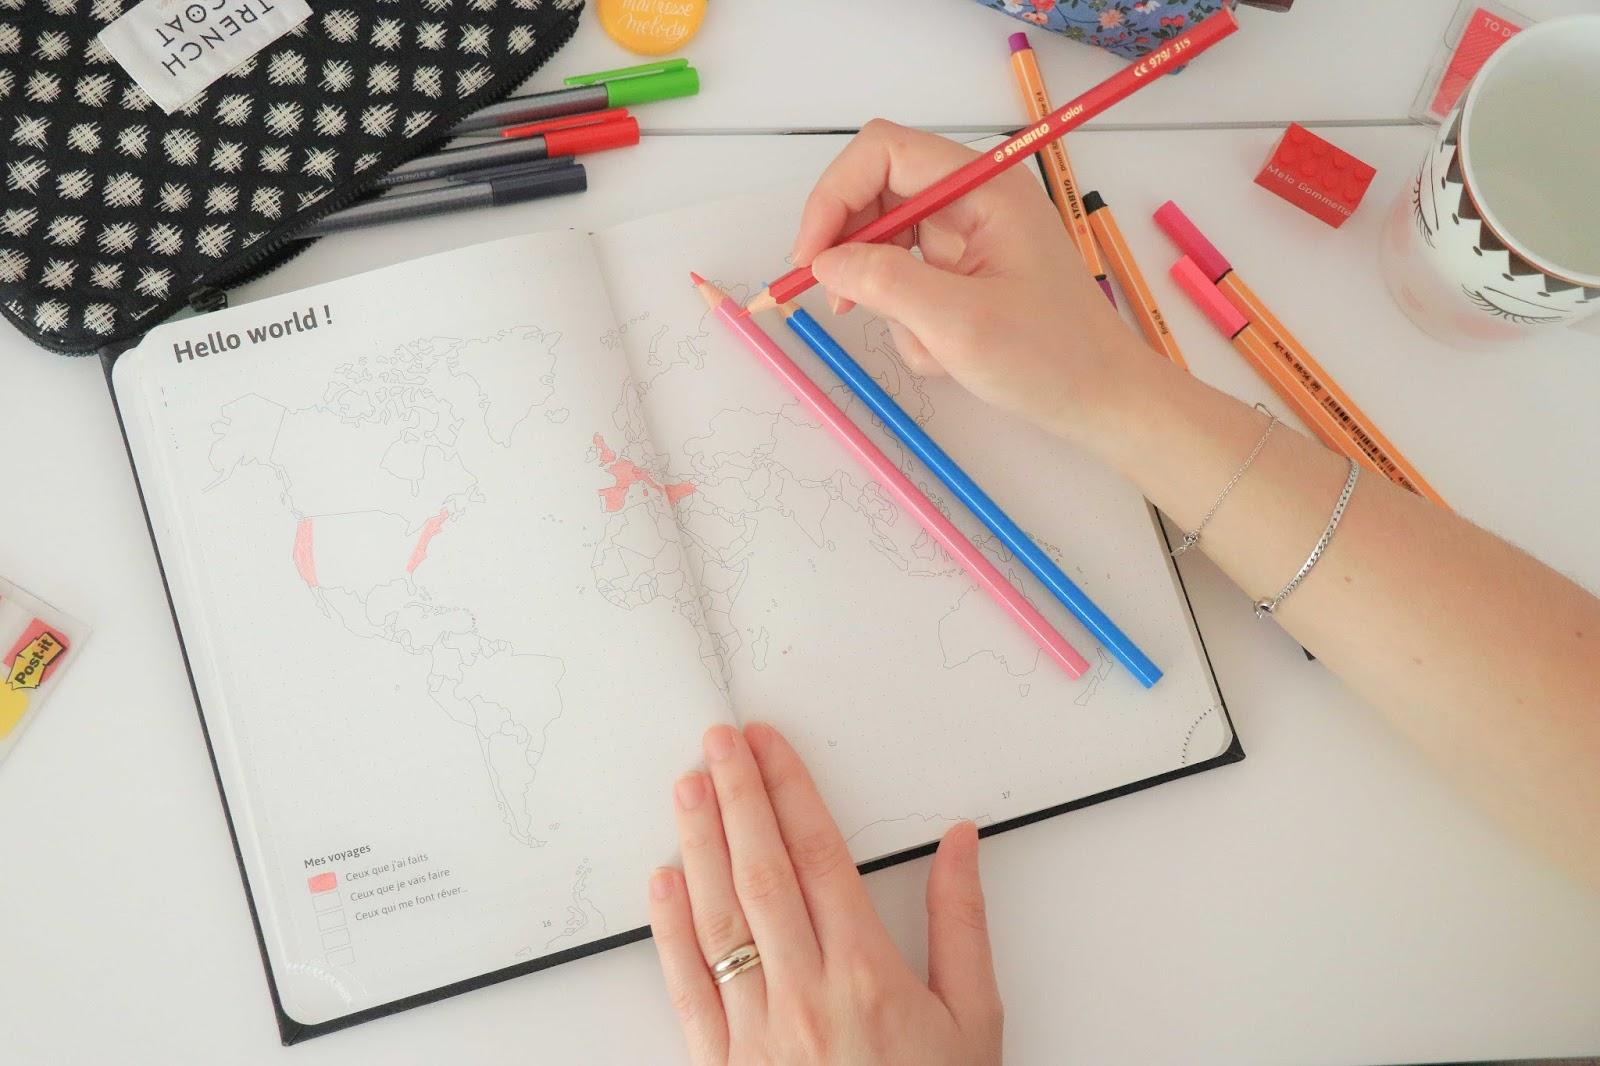 myagenda 365 agenda scolaire bullet journal bujo organisation maitresse ecole lycee universite facile comment concours à gagner